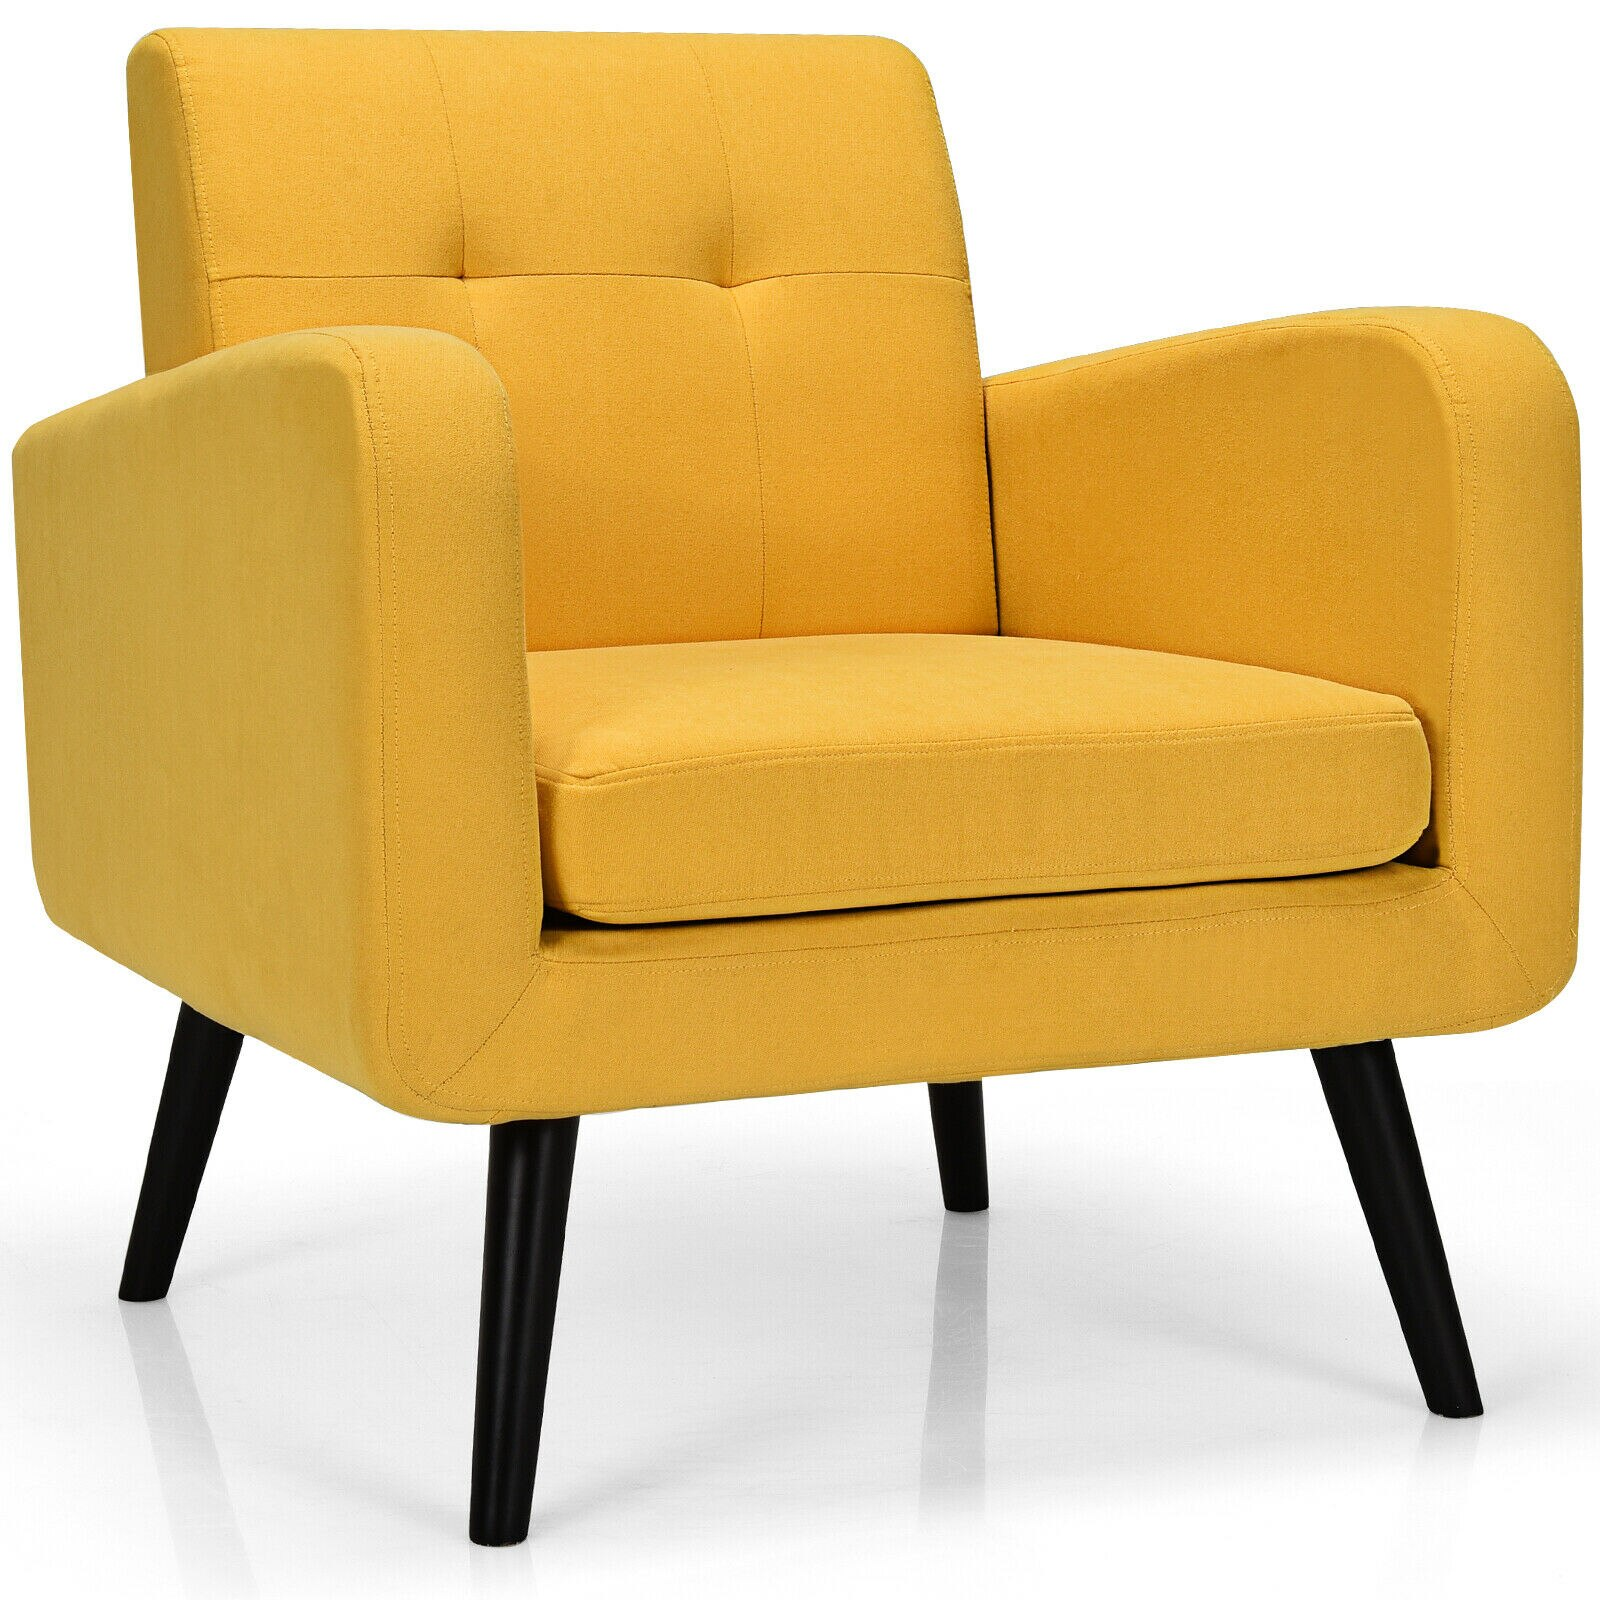 Giantex منتصف القرن لهجة كرسي النسيج الذراع كرسي أريكة واحدة ث/المطاط الخشب الساقين HW66544YE